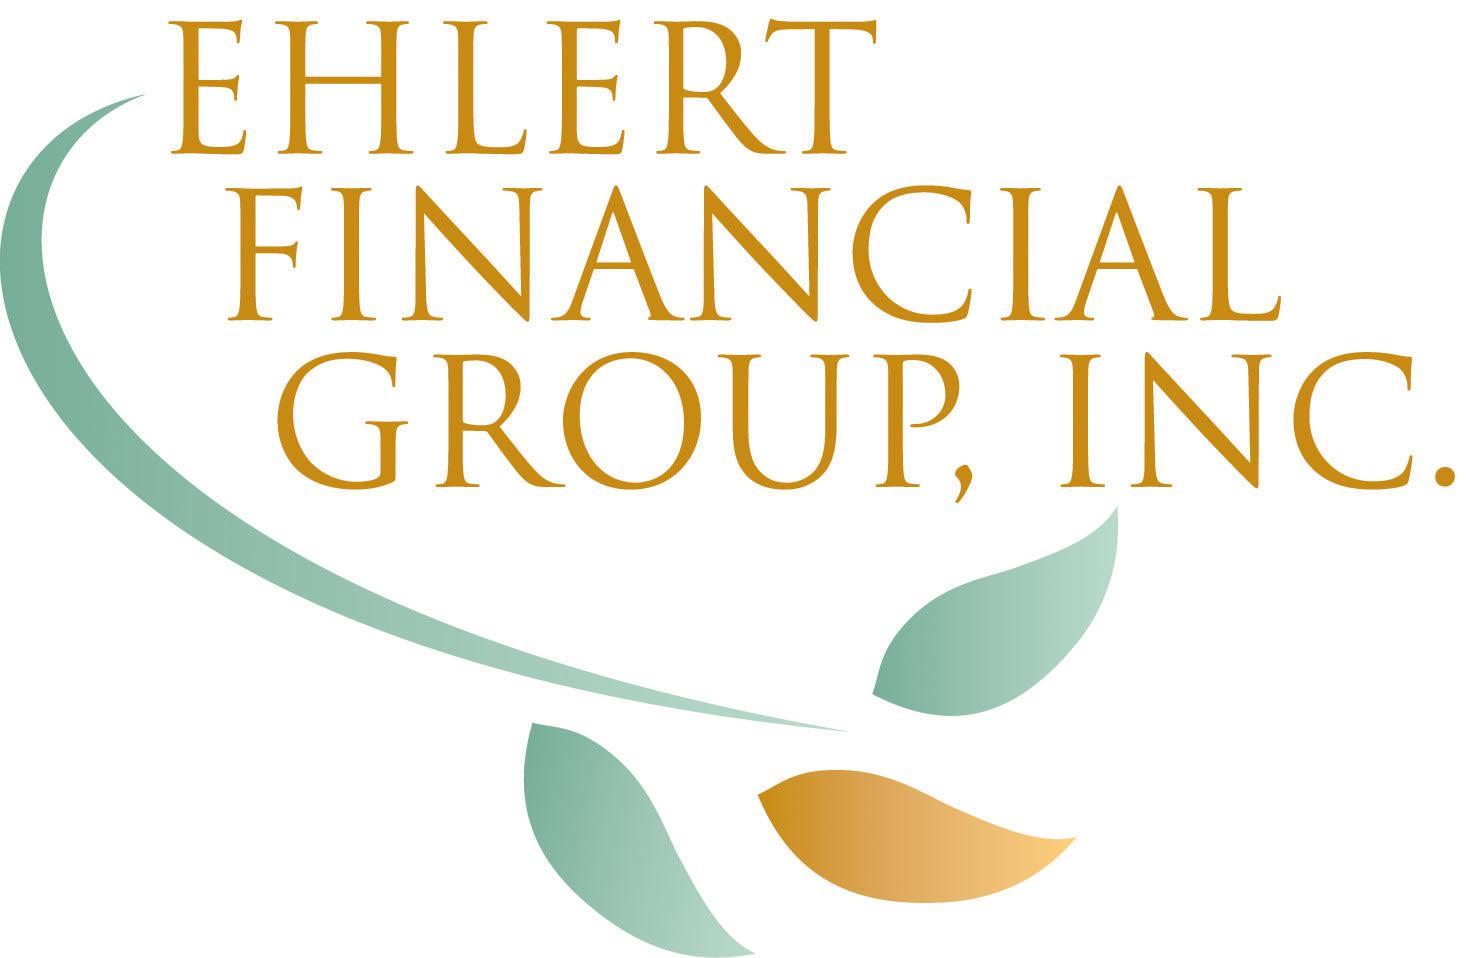 Ehlert Financial Group, Inc.